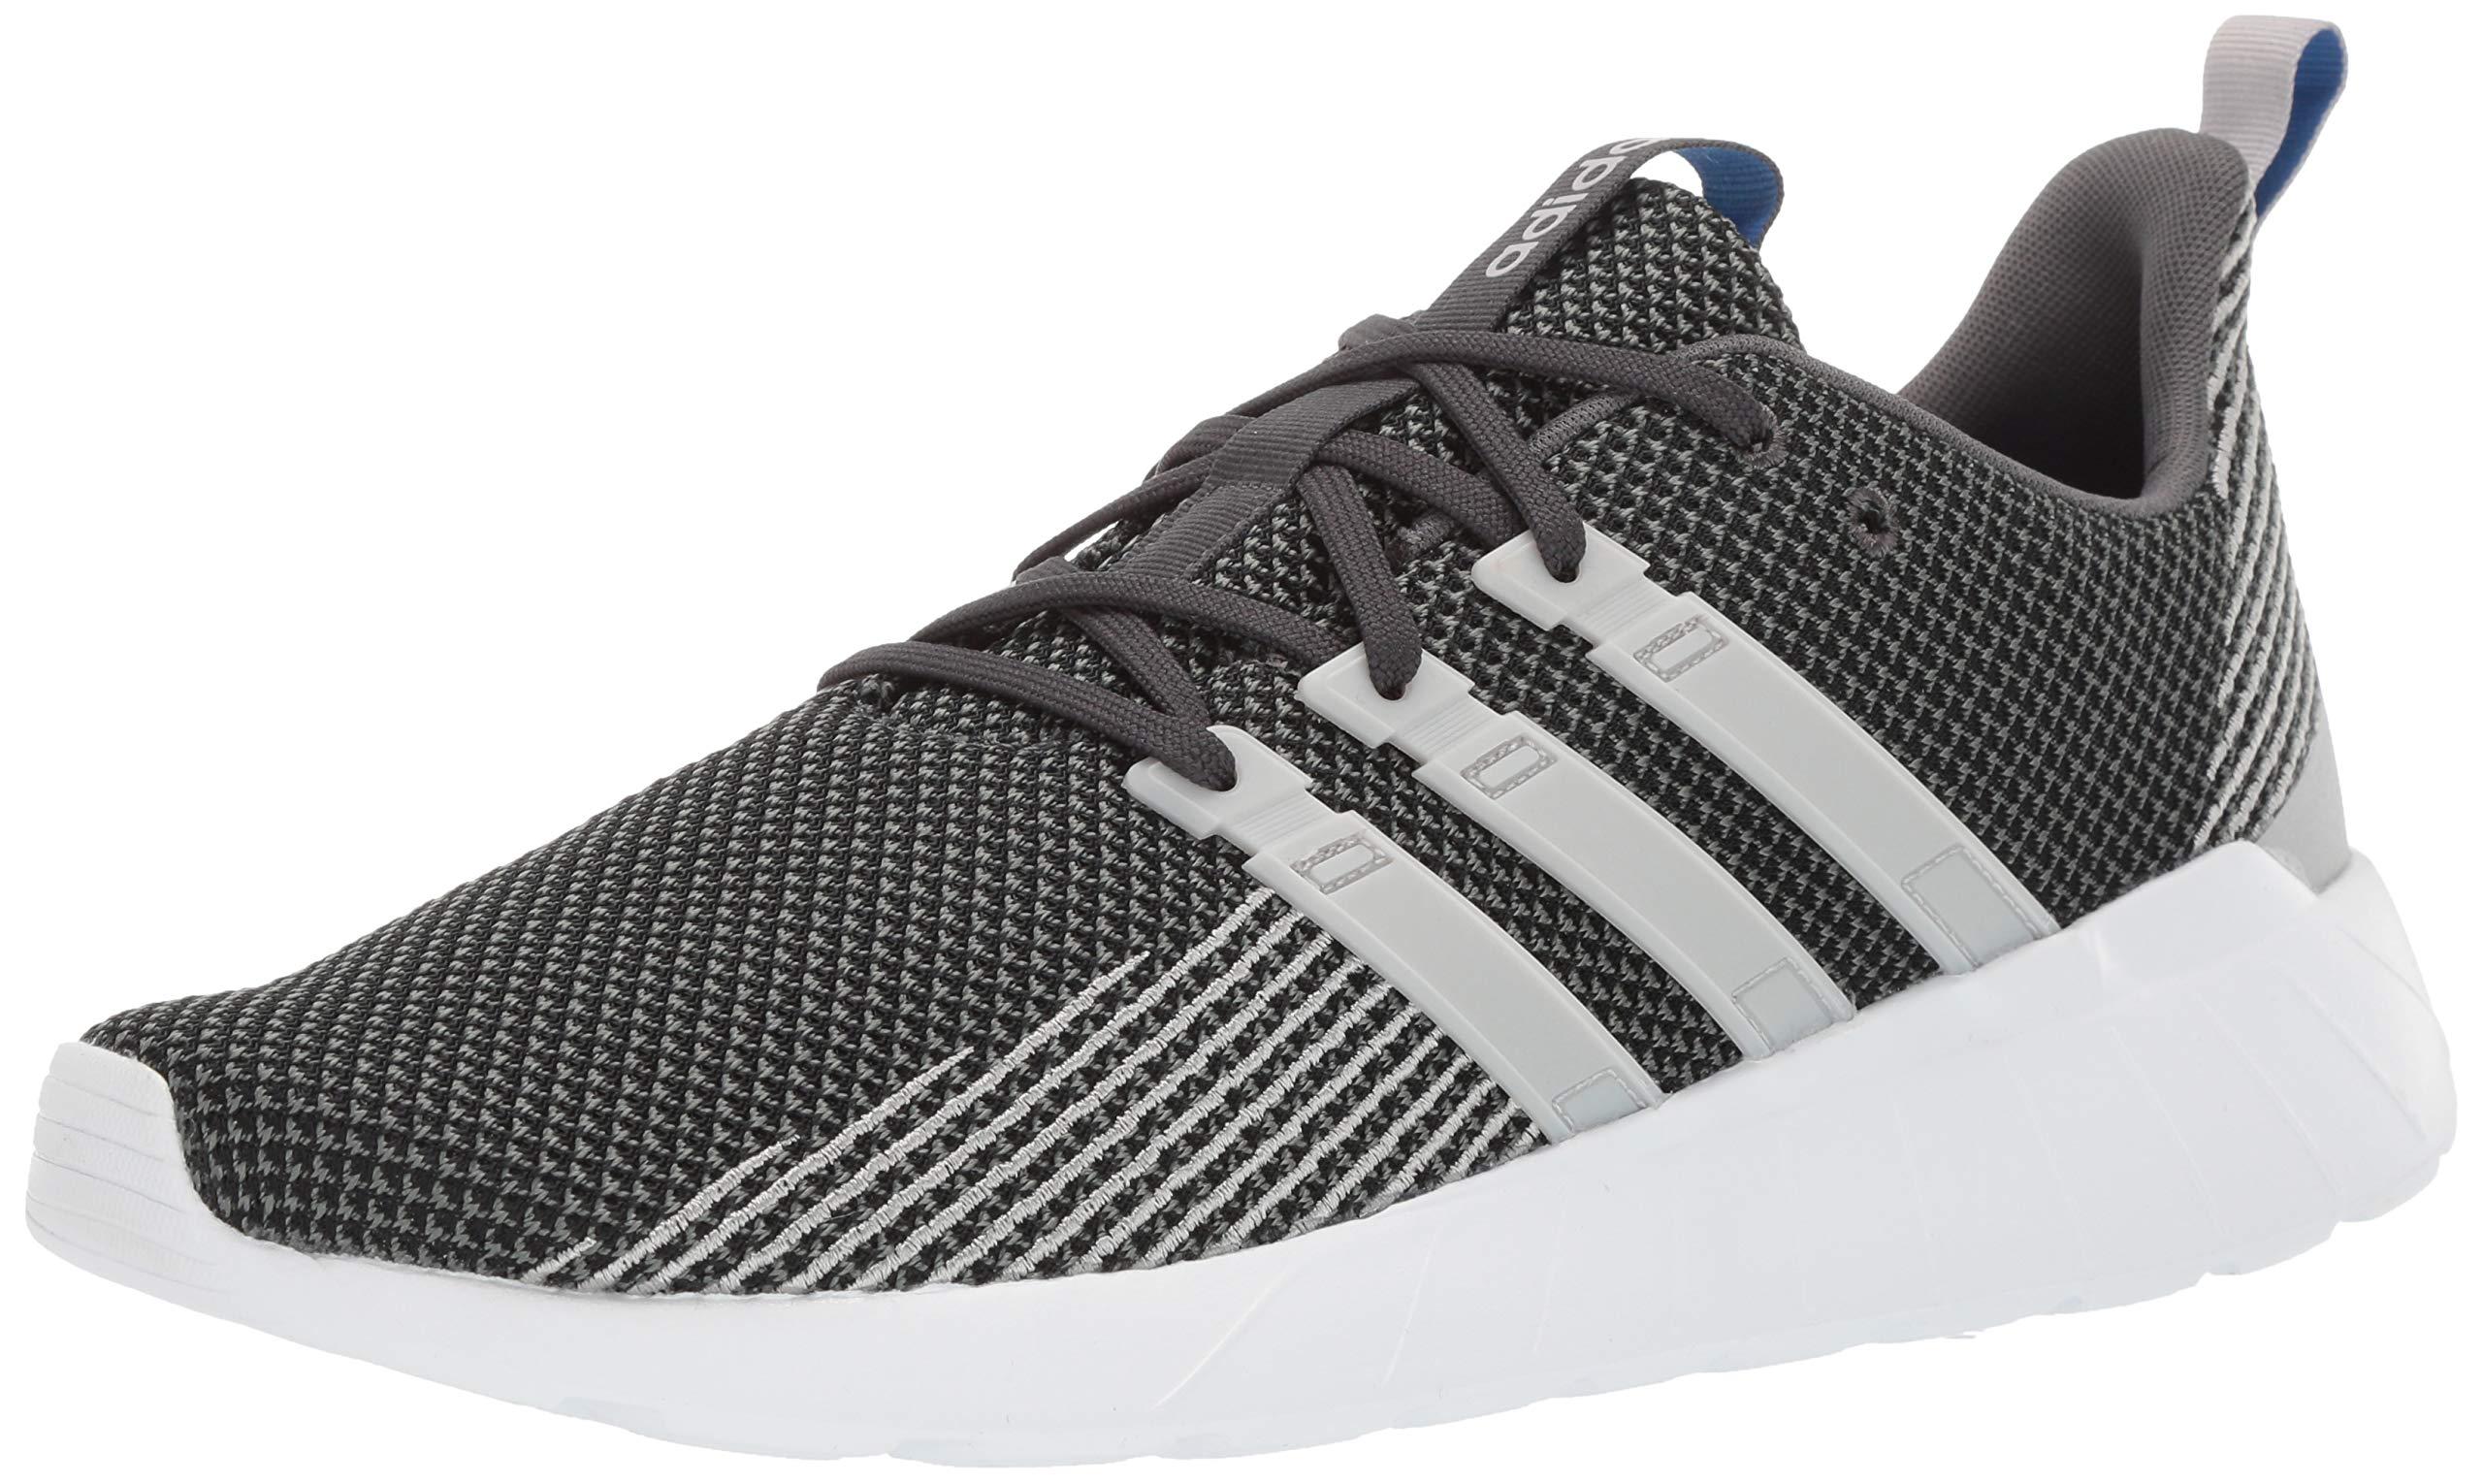 adidas Men's Questar Flow Running Shoe, Grey/True Blue, 11 M US by adidas